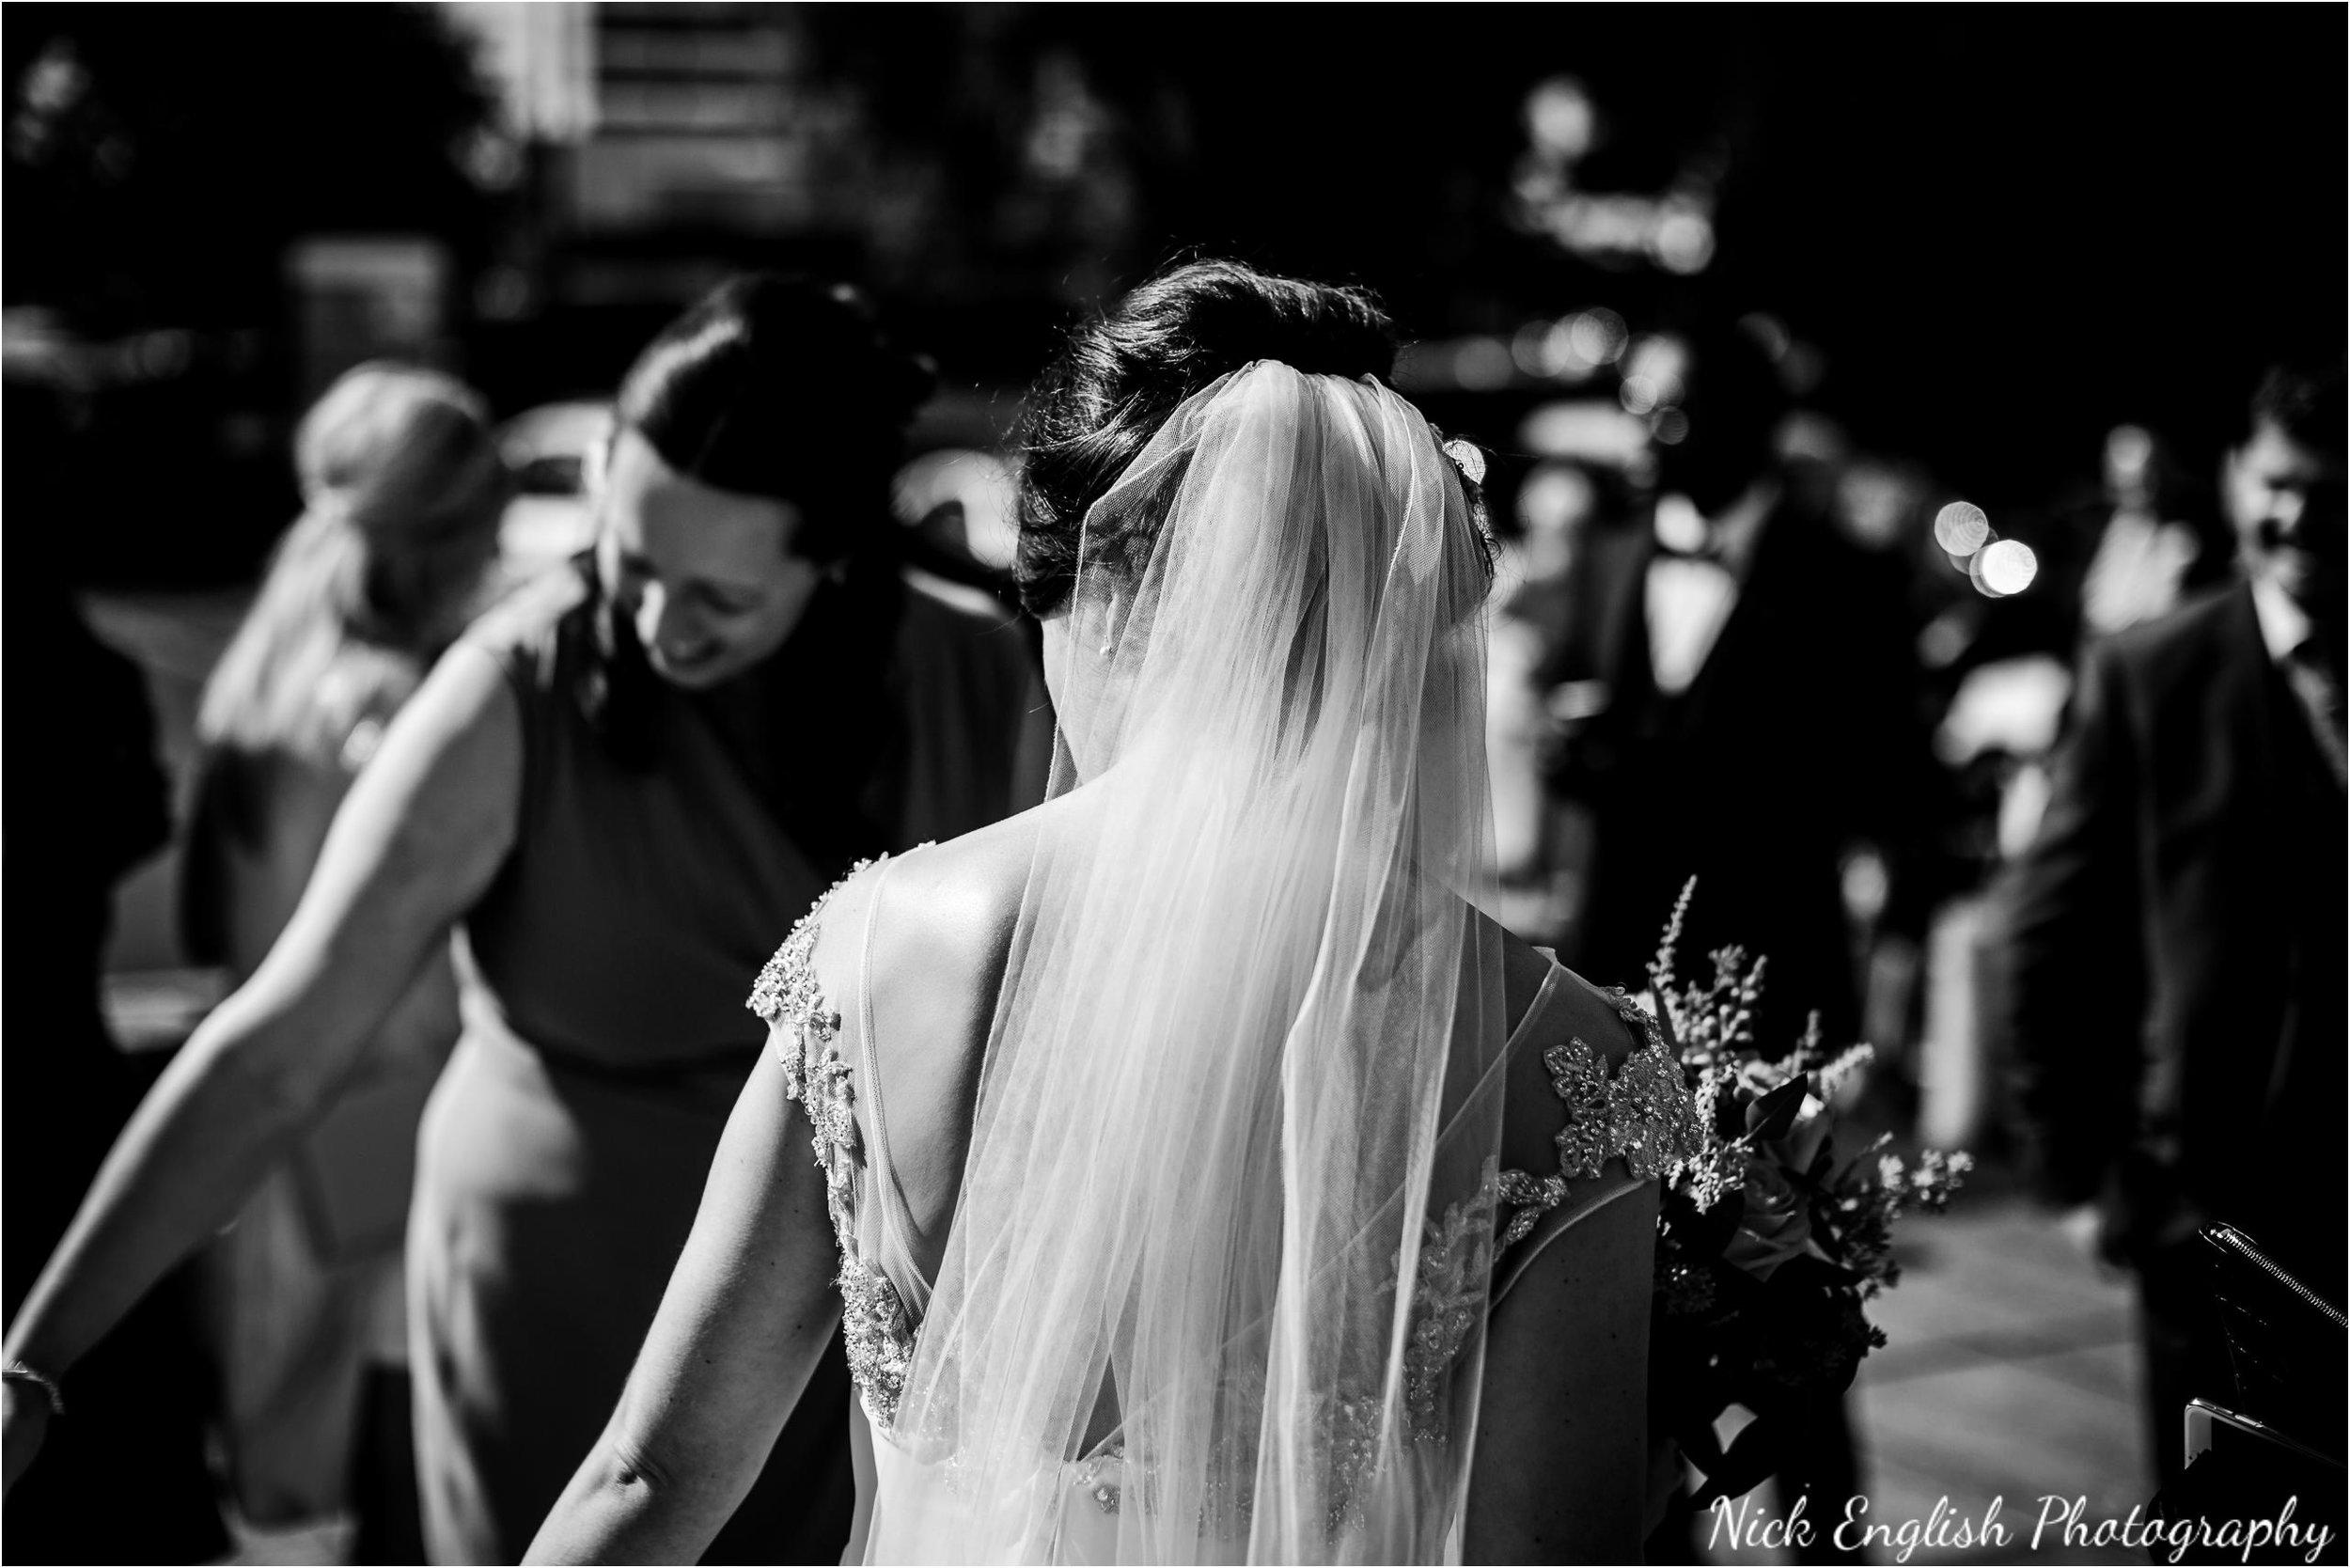 Stacey-Ash-Wedding-Photographs-Stanley-House-Preston-Lancashire-92.jpg